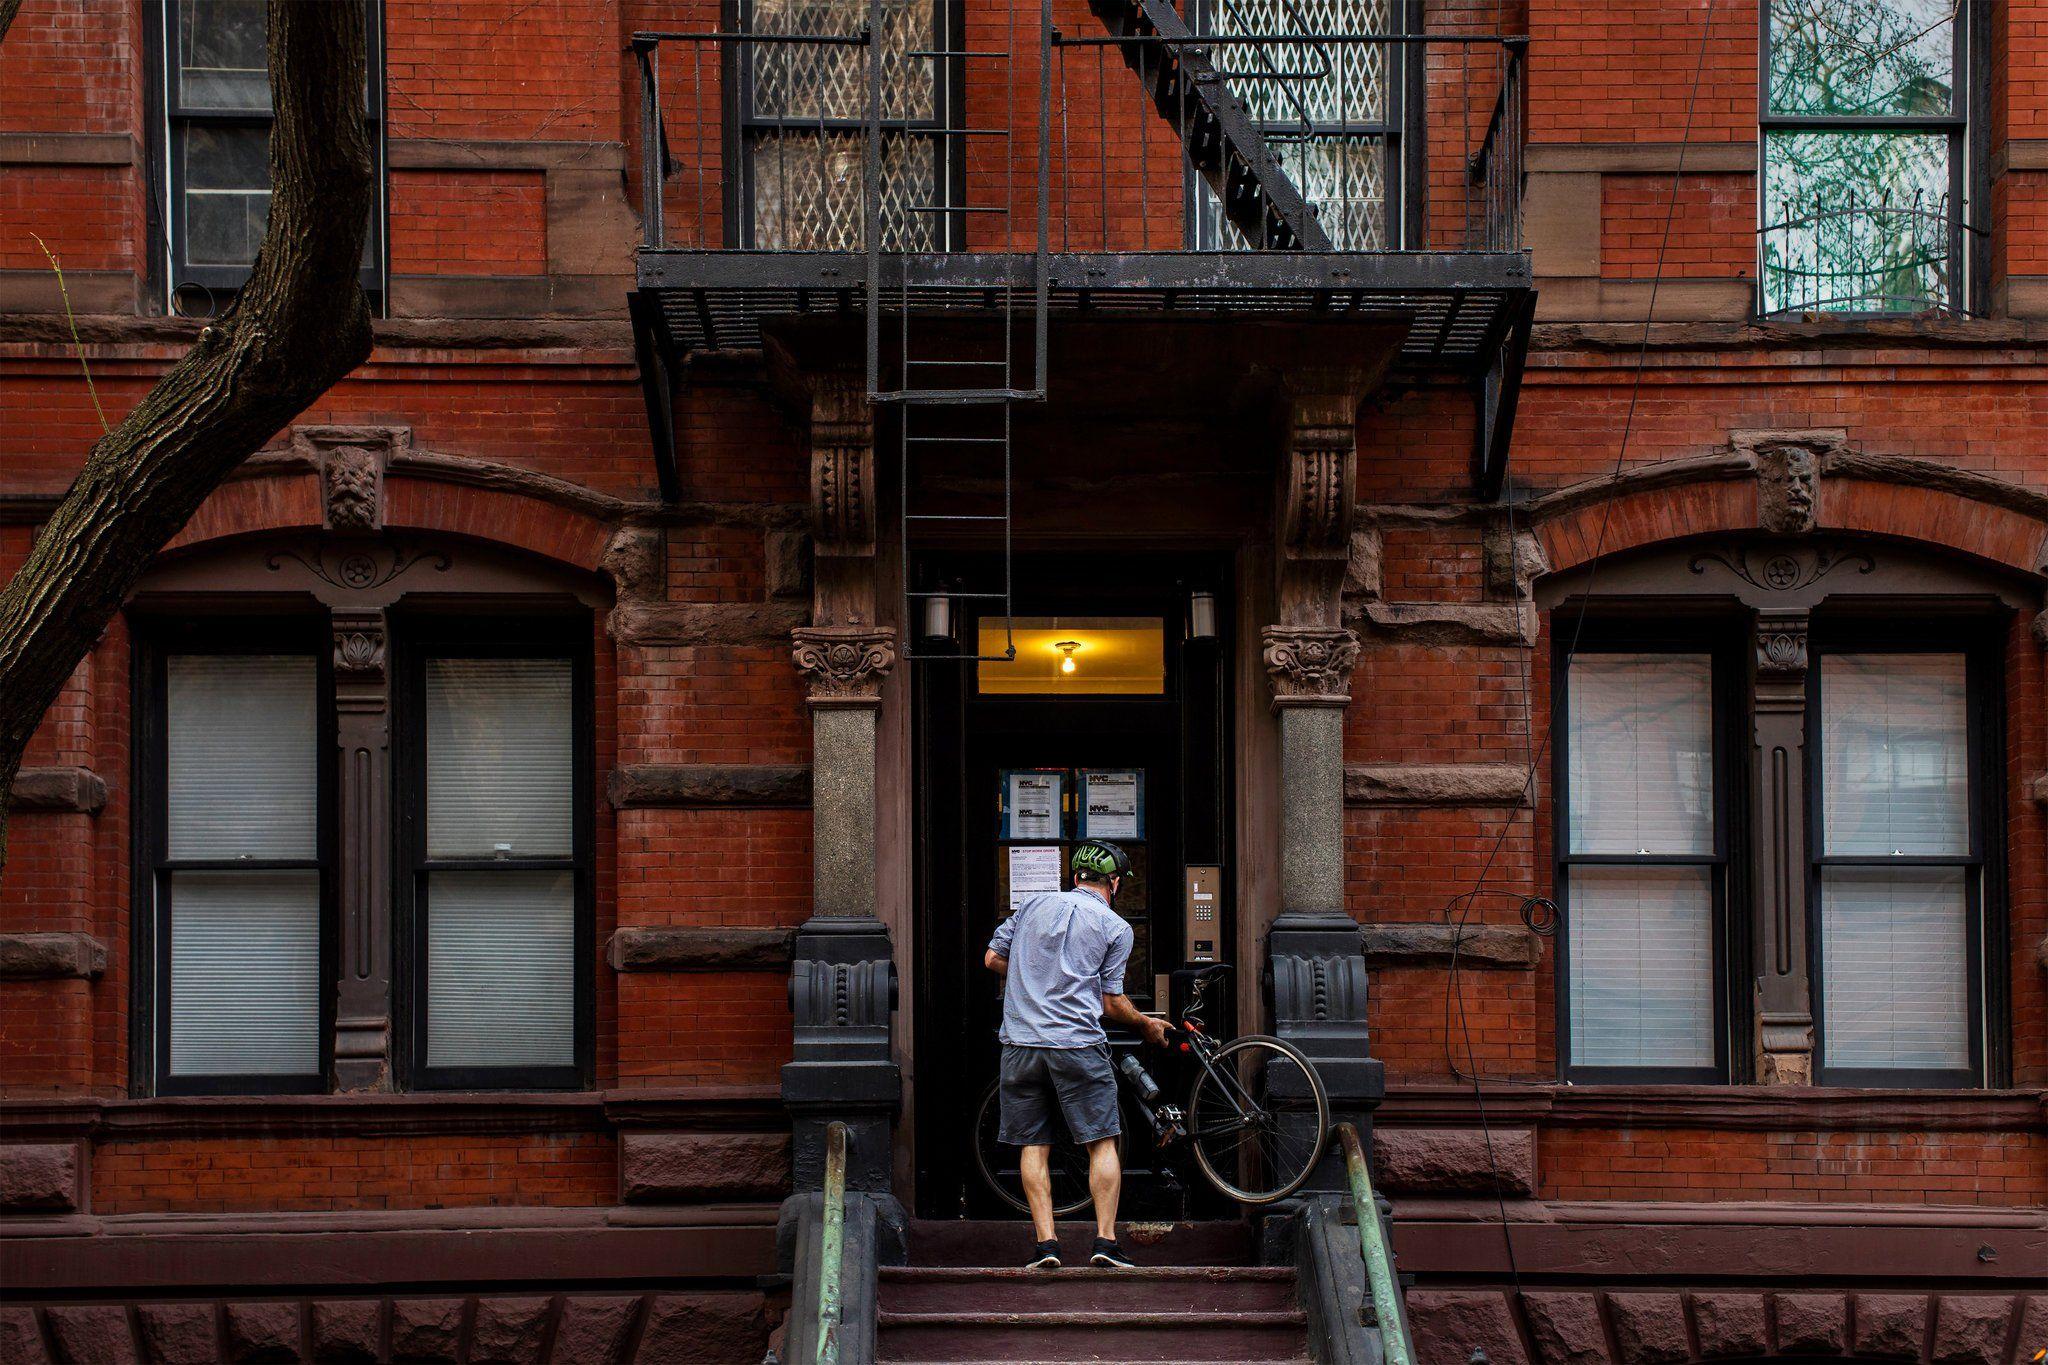 Behind New York S Housing Crisis Weakened Laws And Fragmented Regulation Being A Landlord Regulators New York